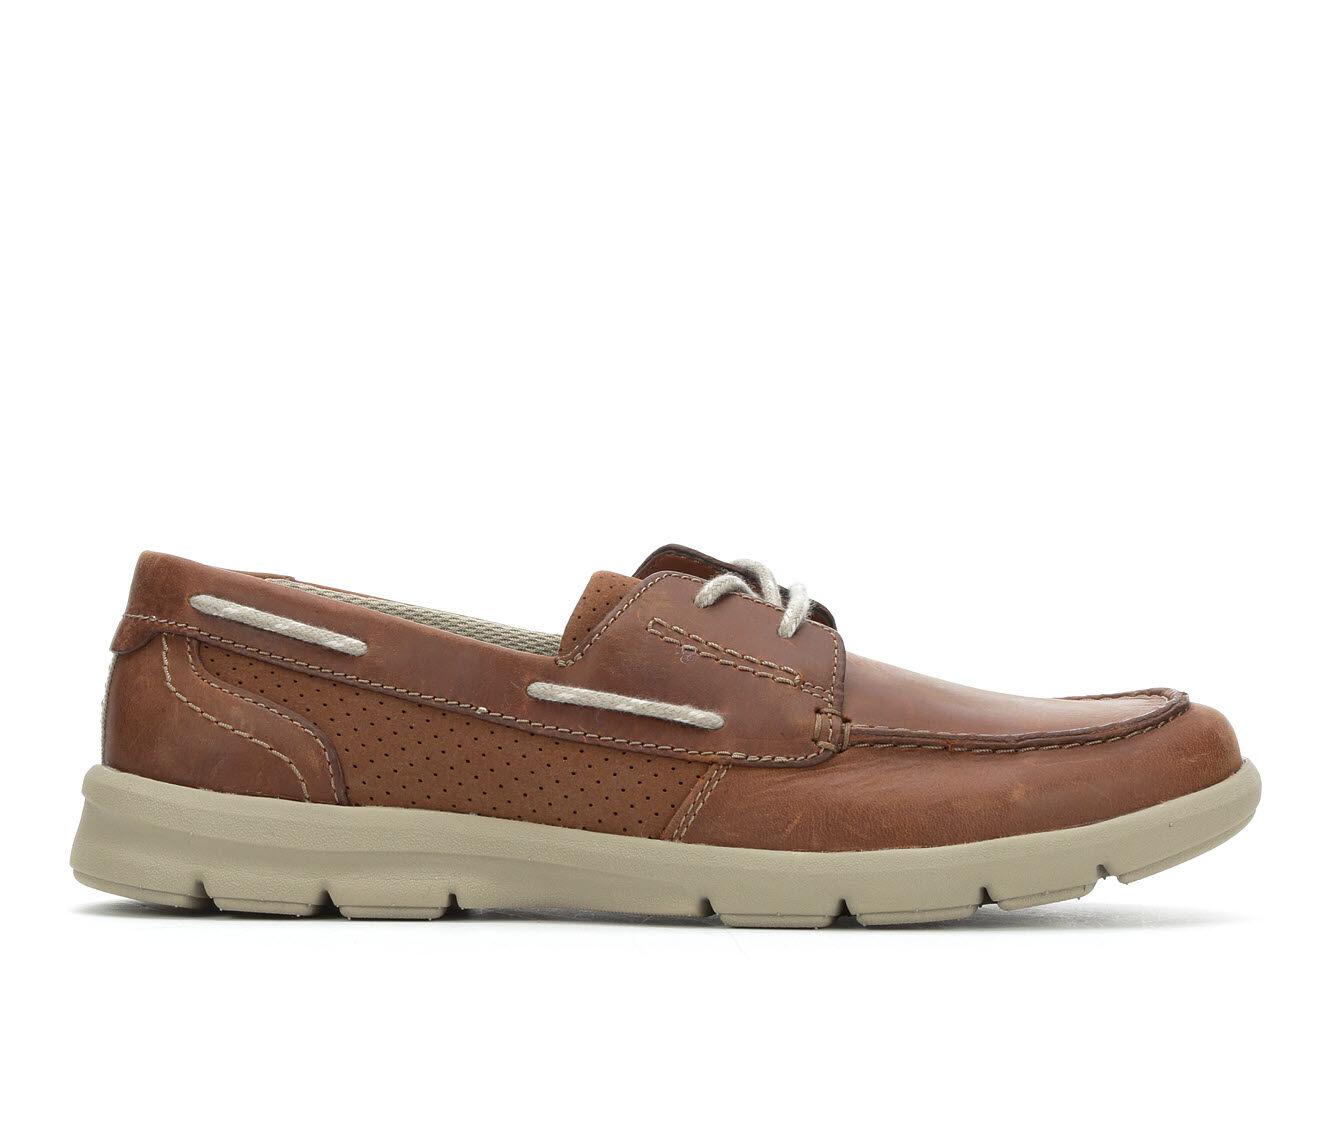 uk shoes_kd1279